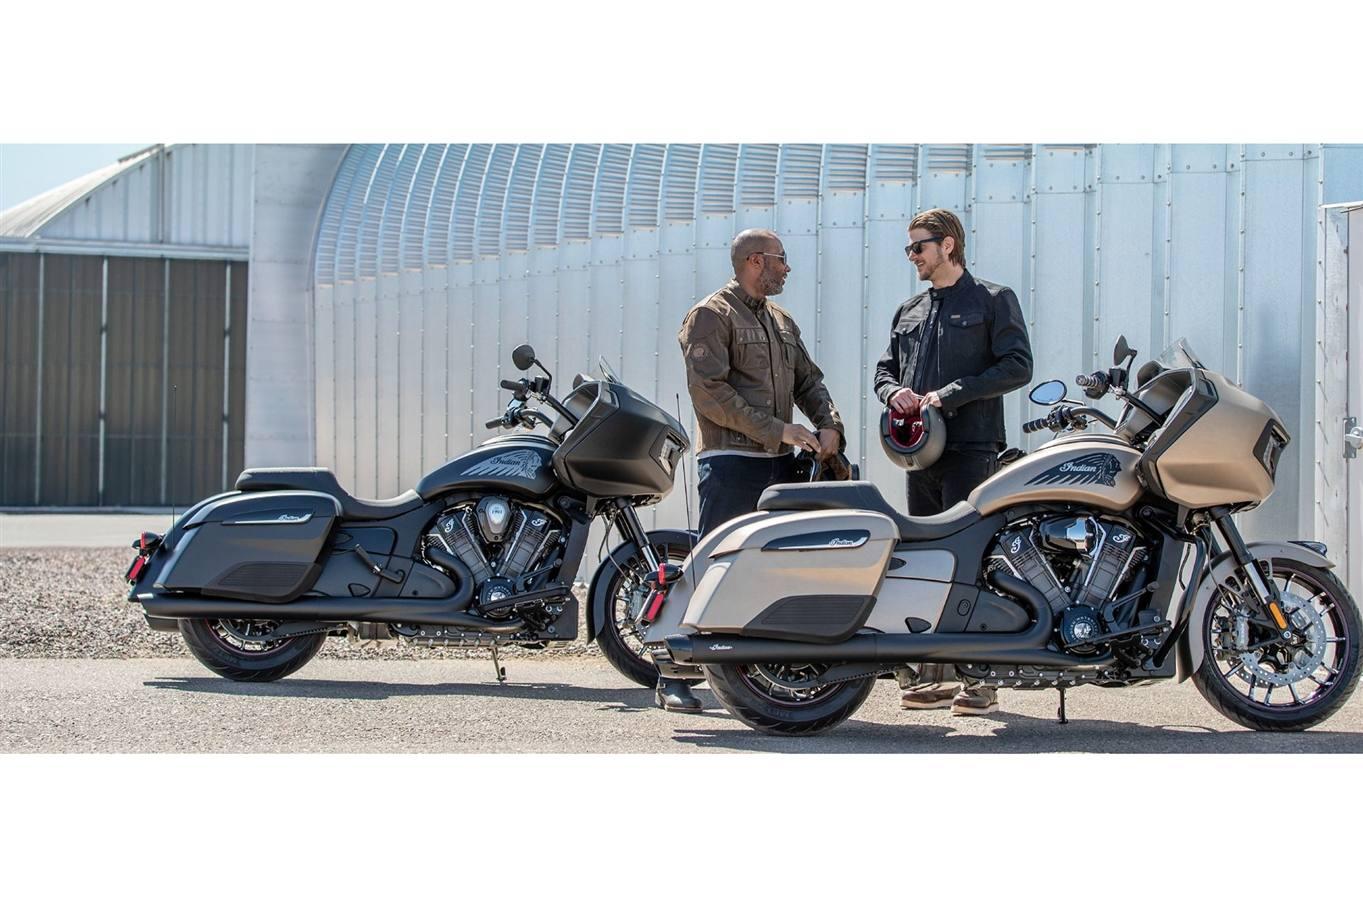 indian challenger motorcycle horse dark option motorcycles latrobe pa